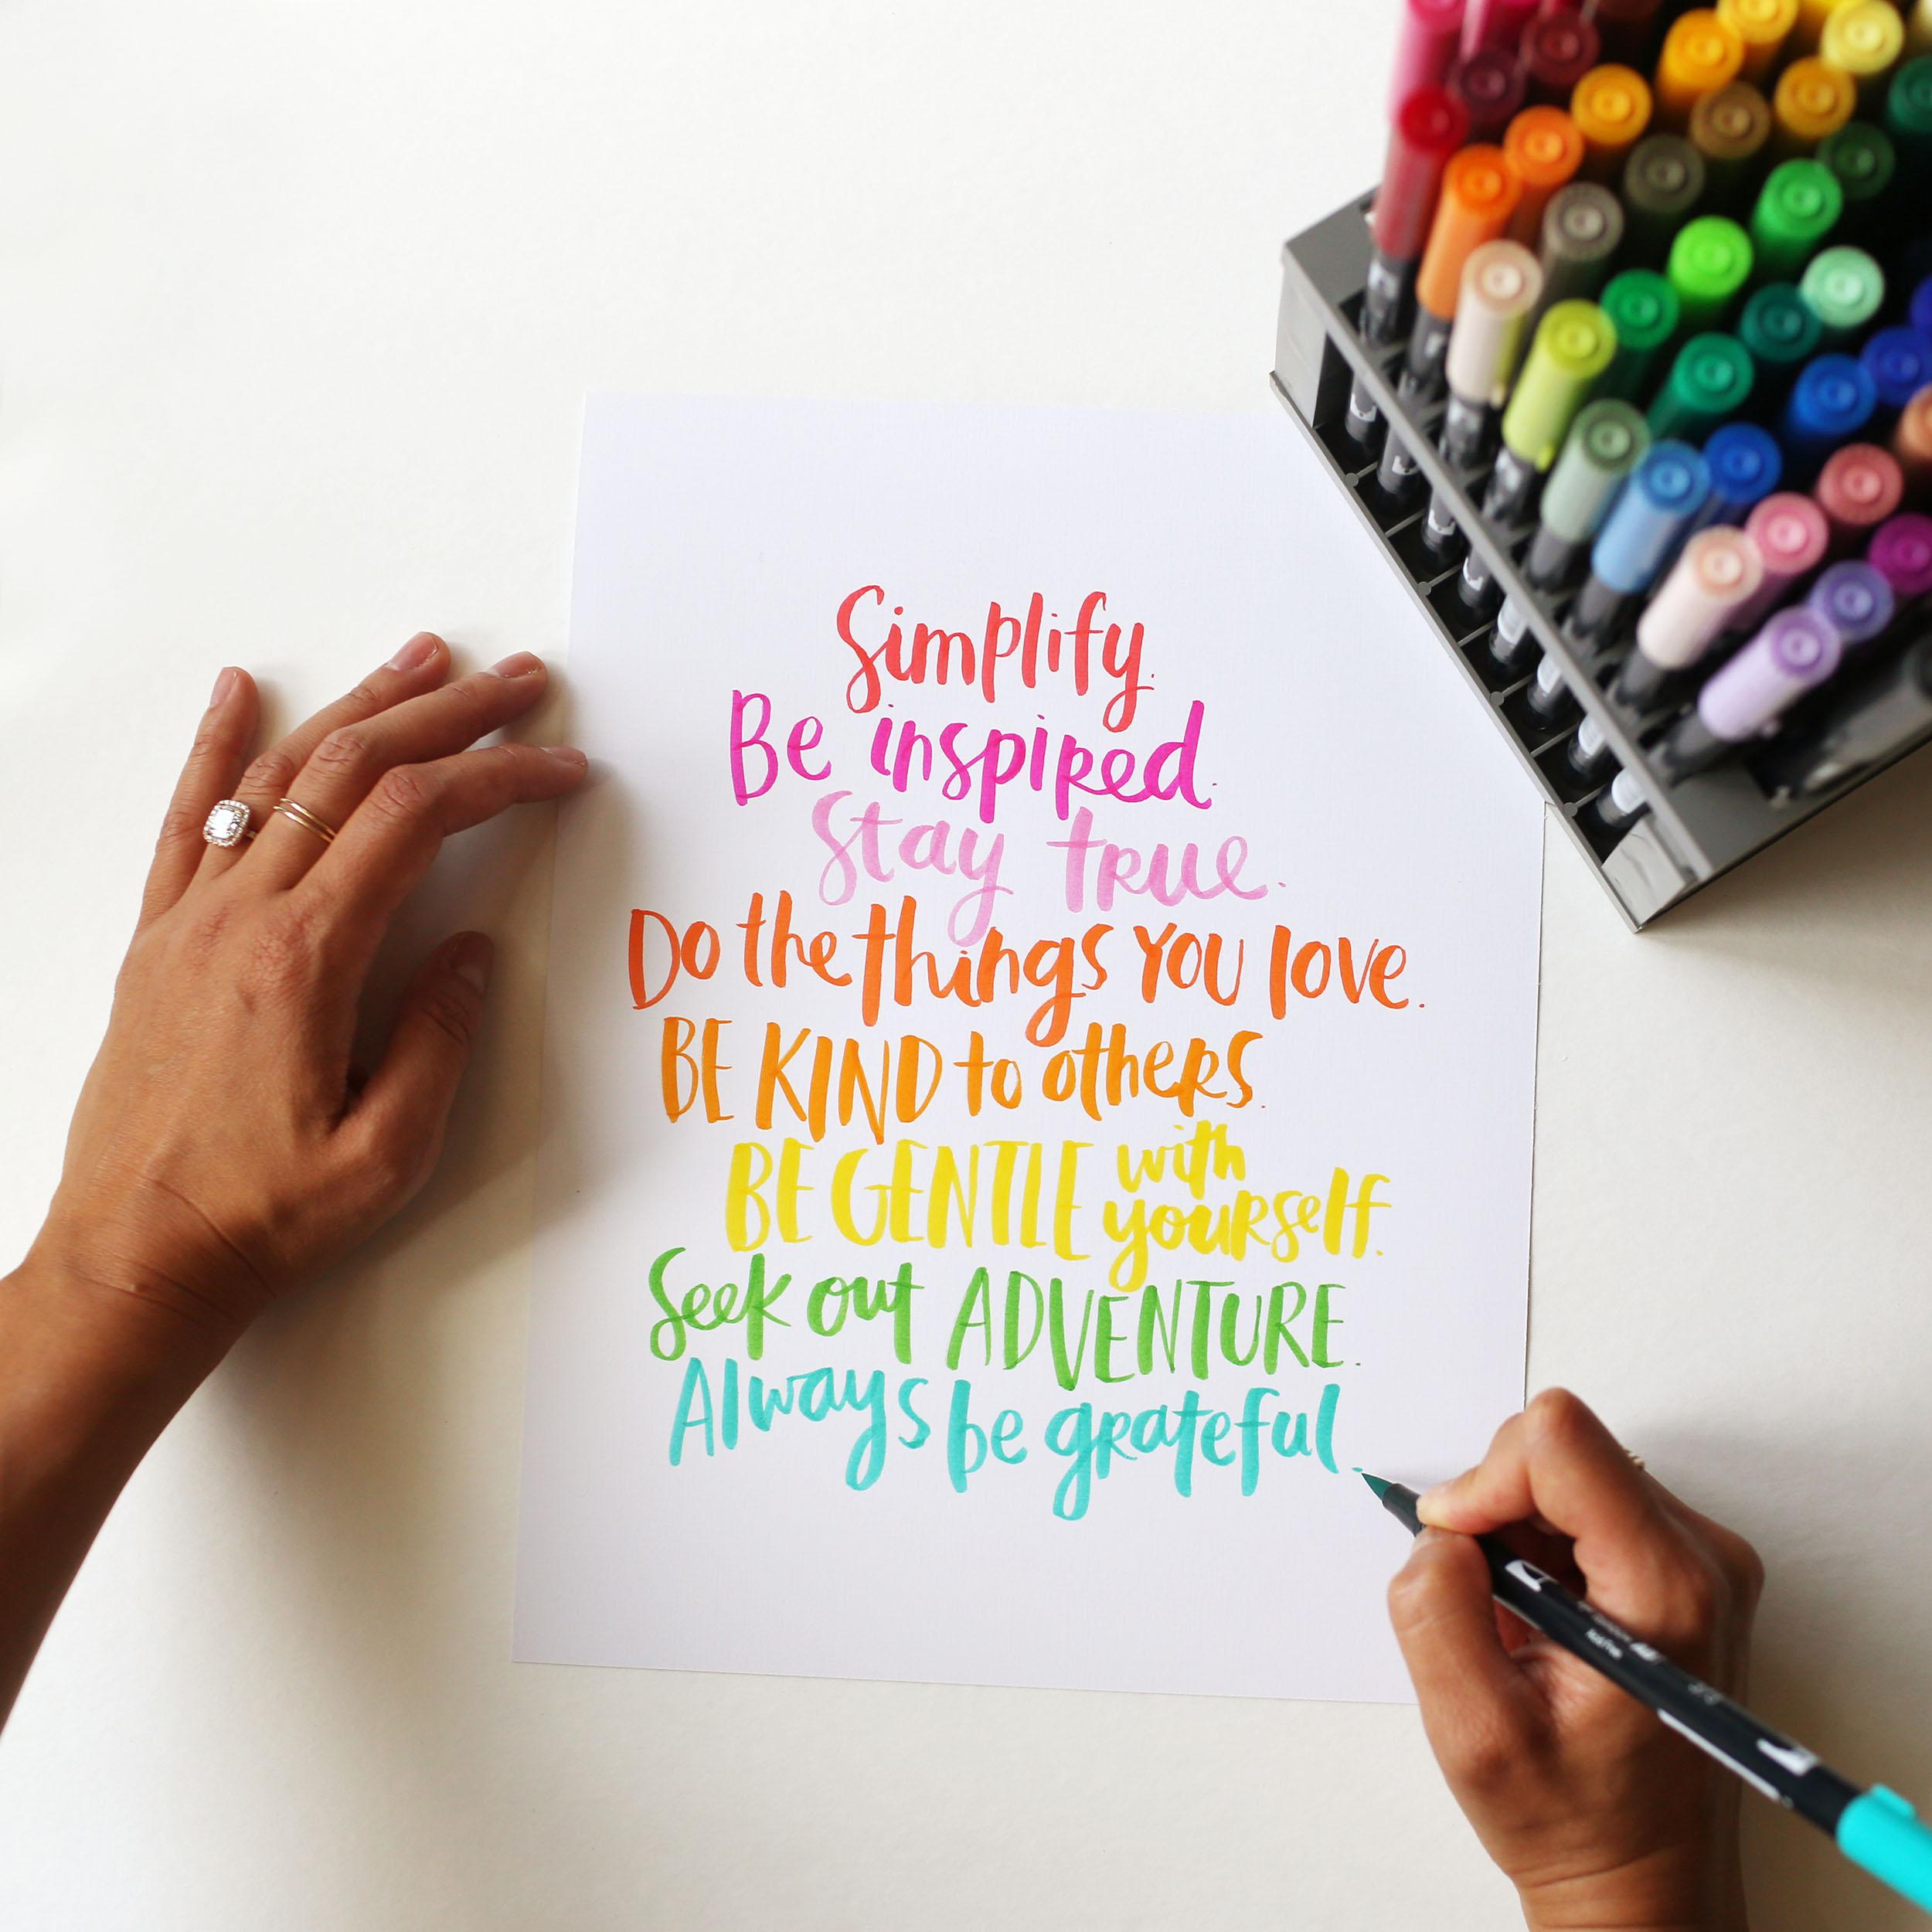 Amy Tangerine's free printable manifesto